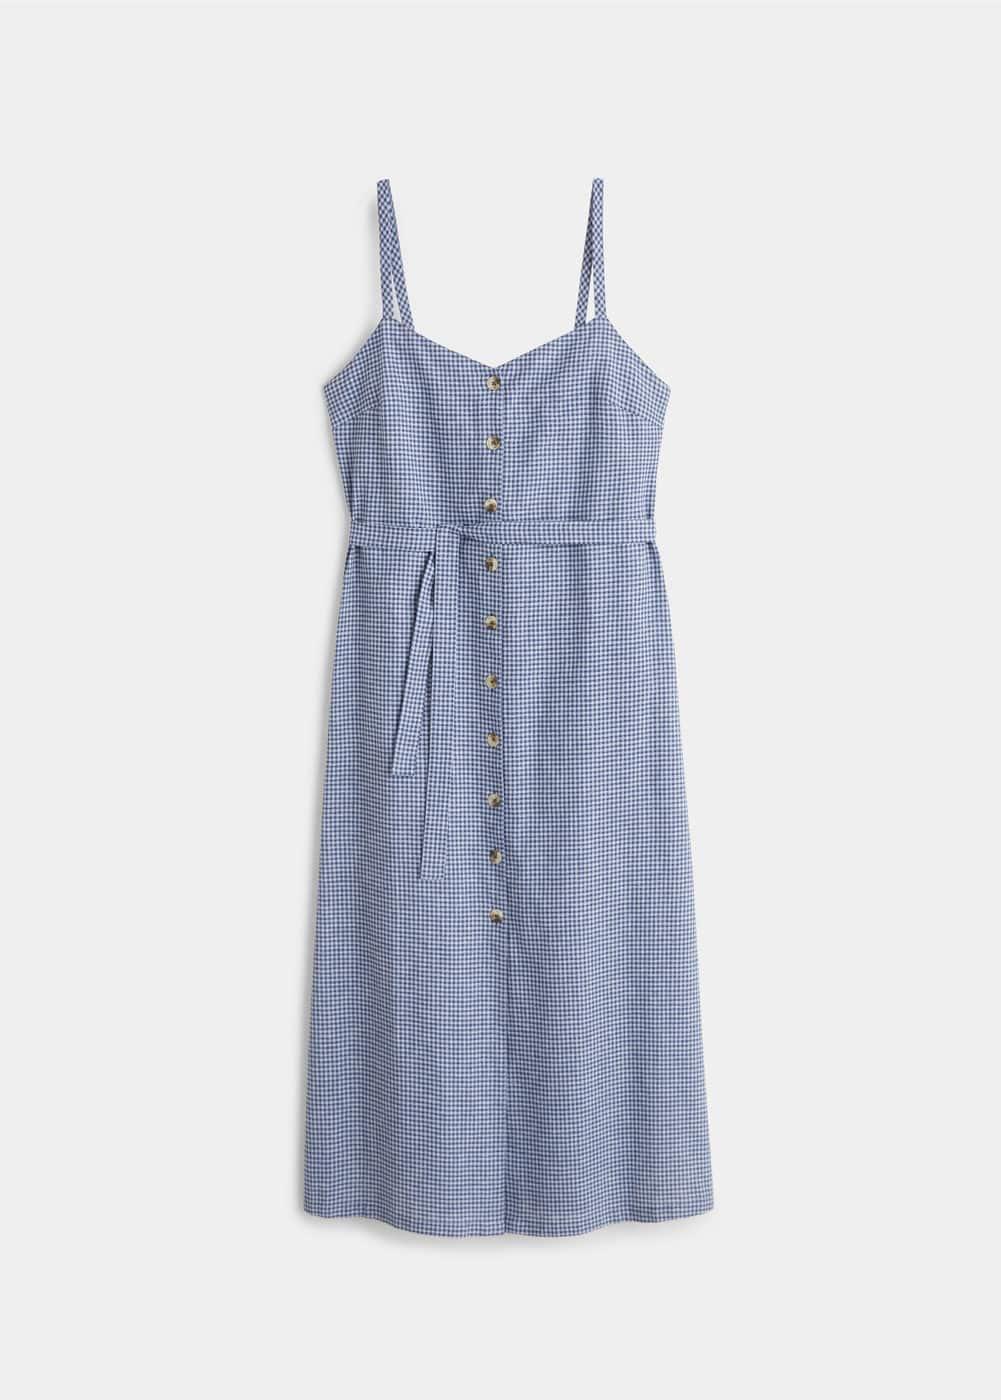 da71c97a8a9411 Vichy check dress - Plus sizes